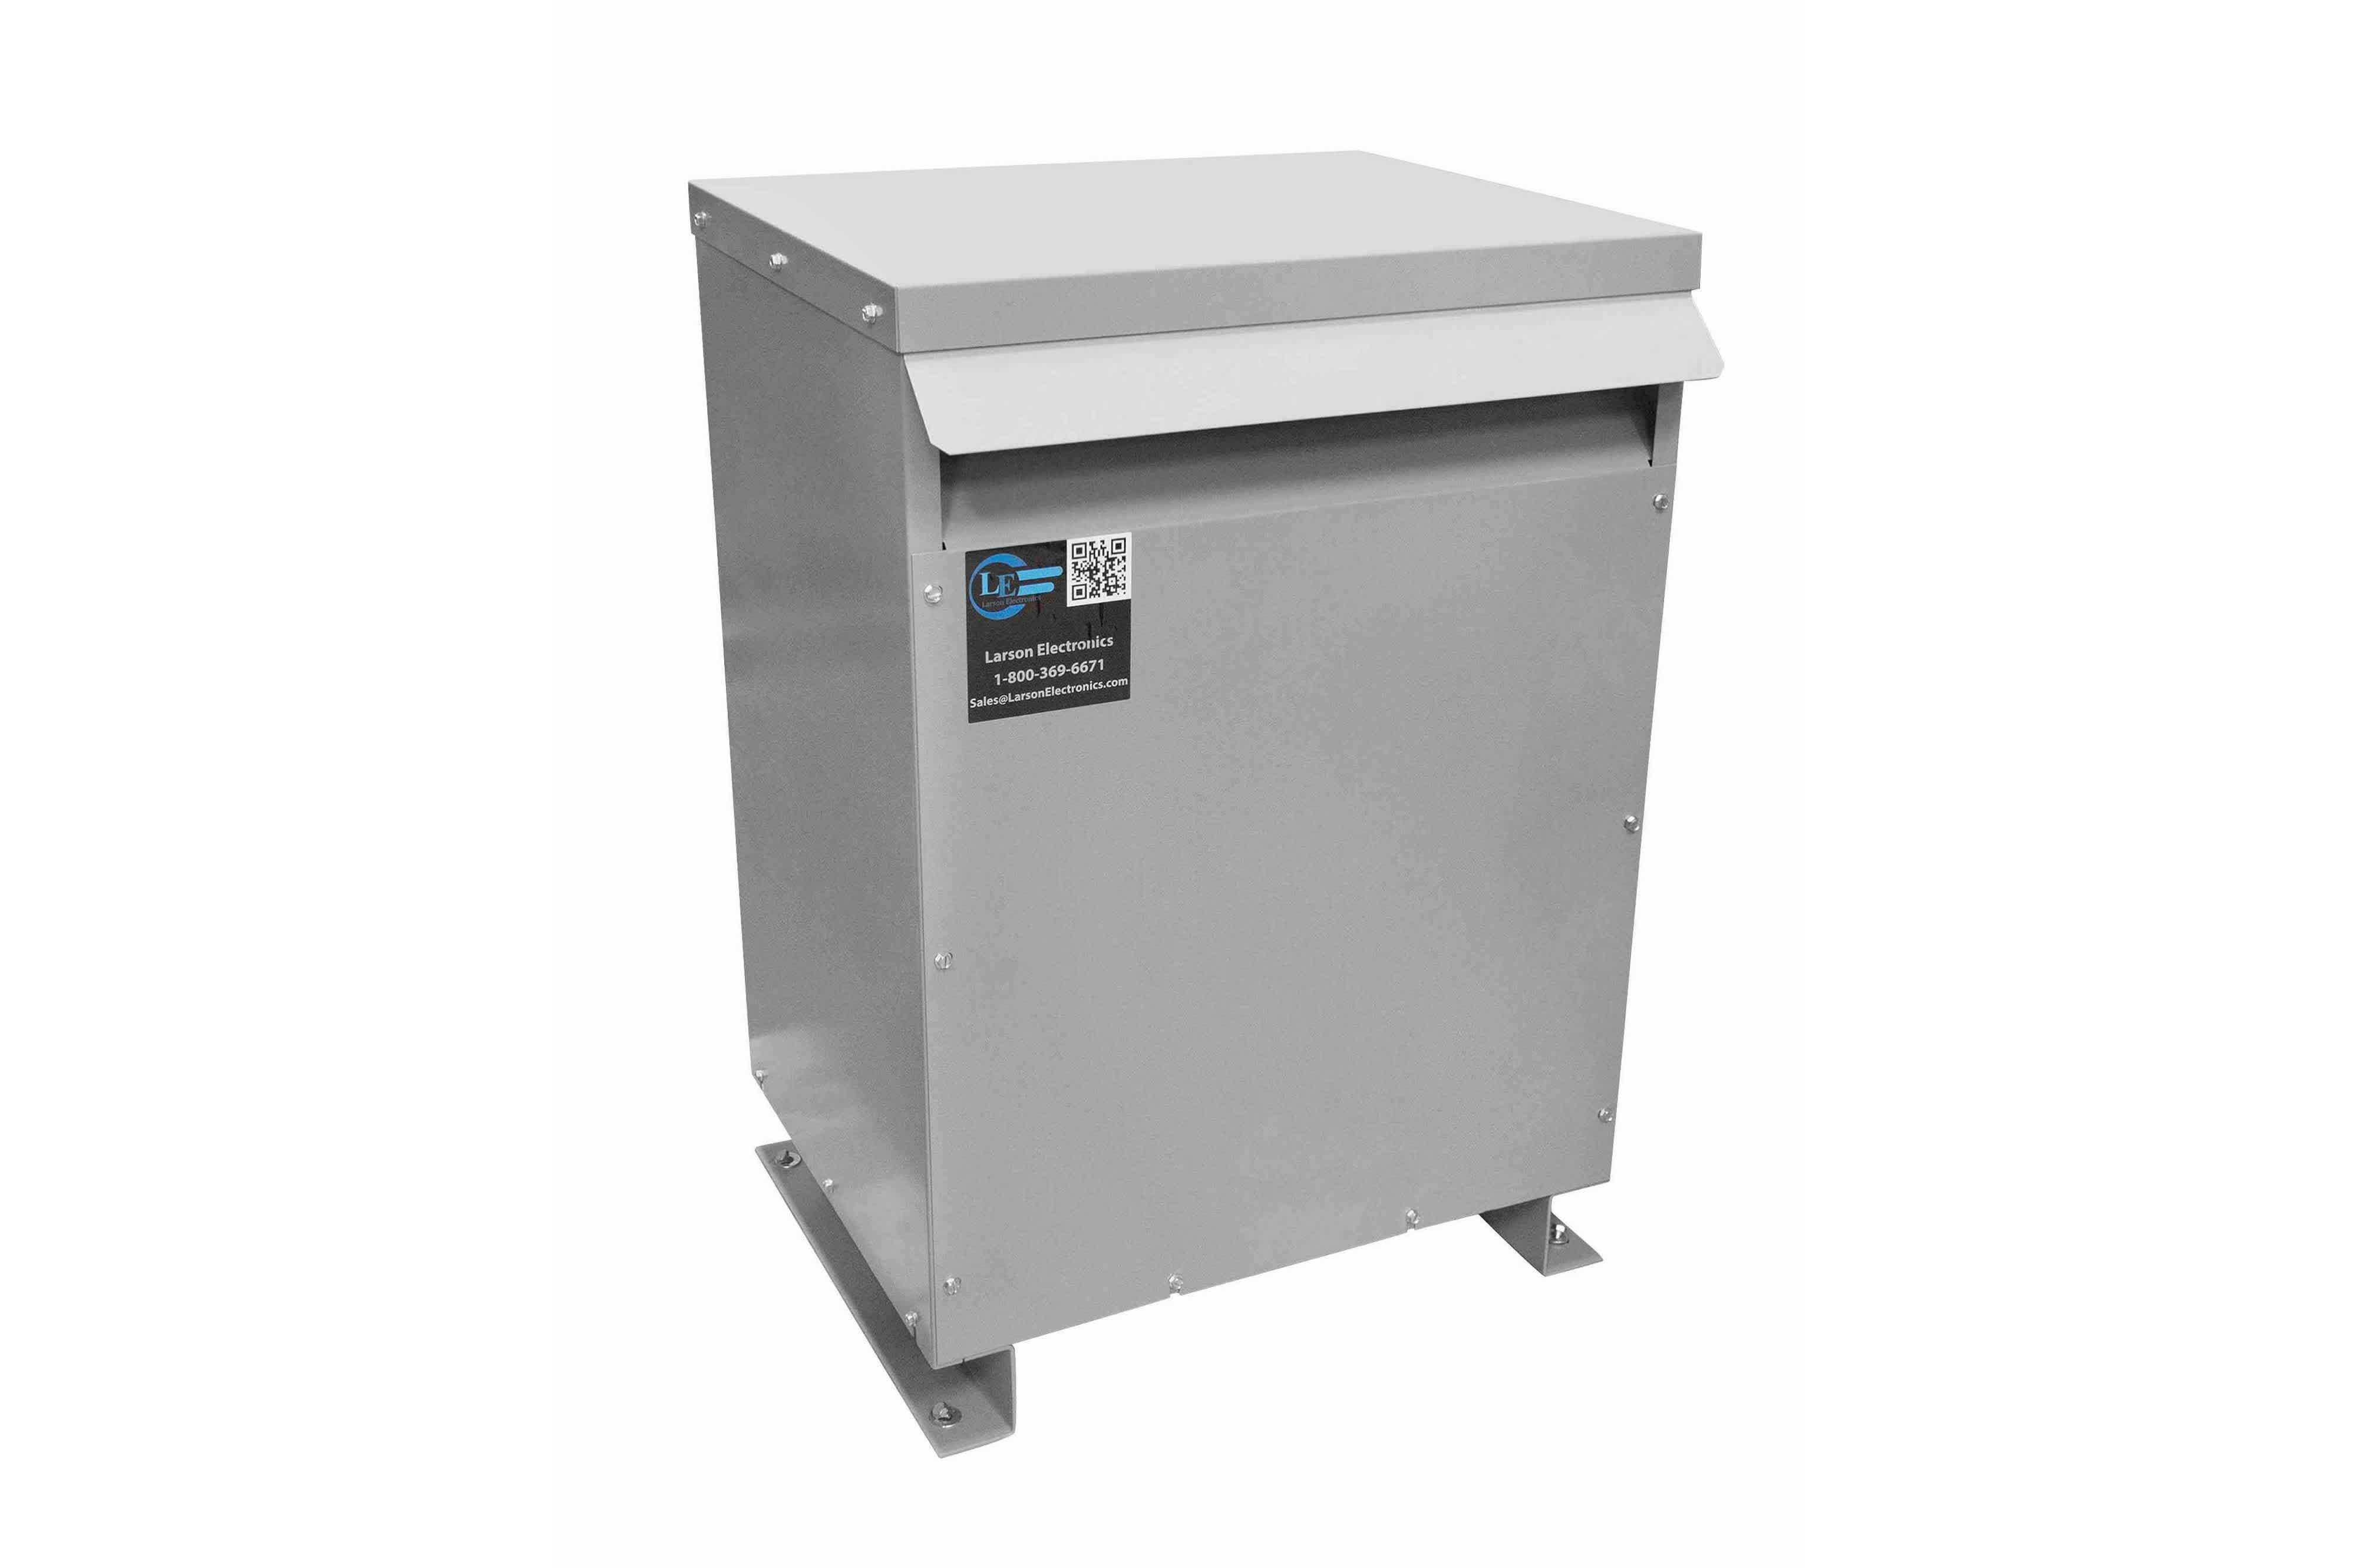 125 kVA 3PH Isolation Transformer, 400V Wye Primary, 240V/120 Delta Secondary, N3R, Ventilated, 60 Hz